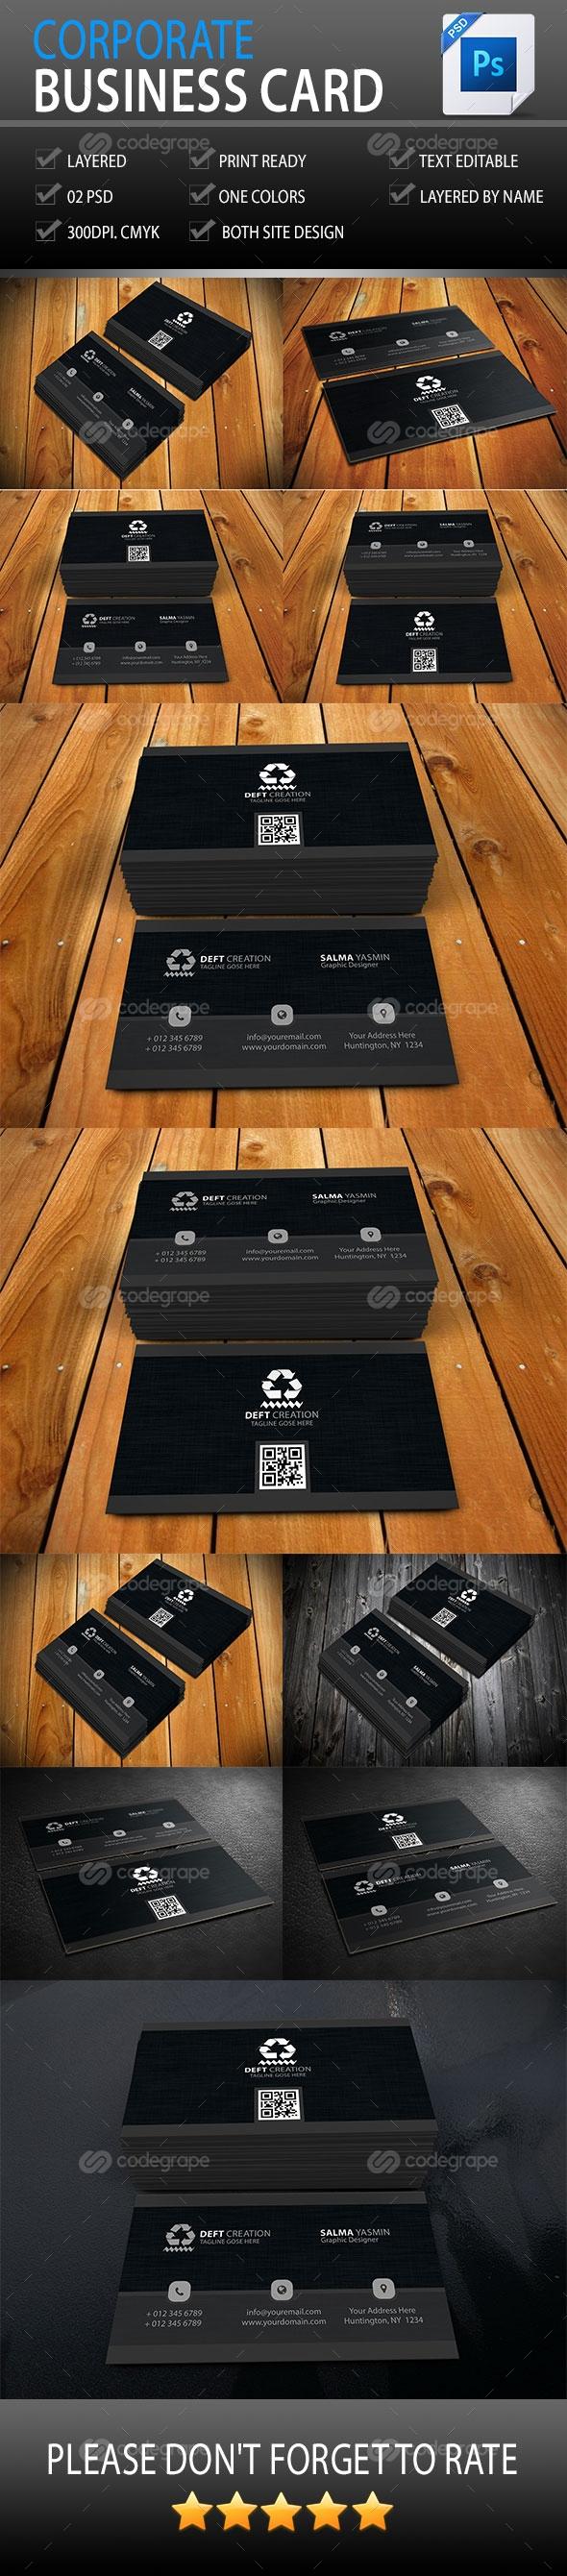 Corporate Business Card Vol-4.0